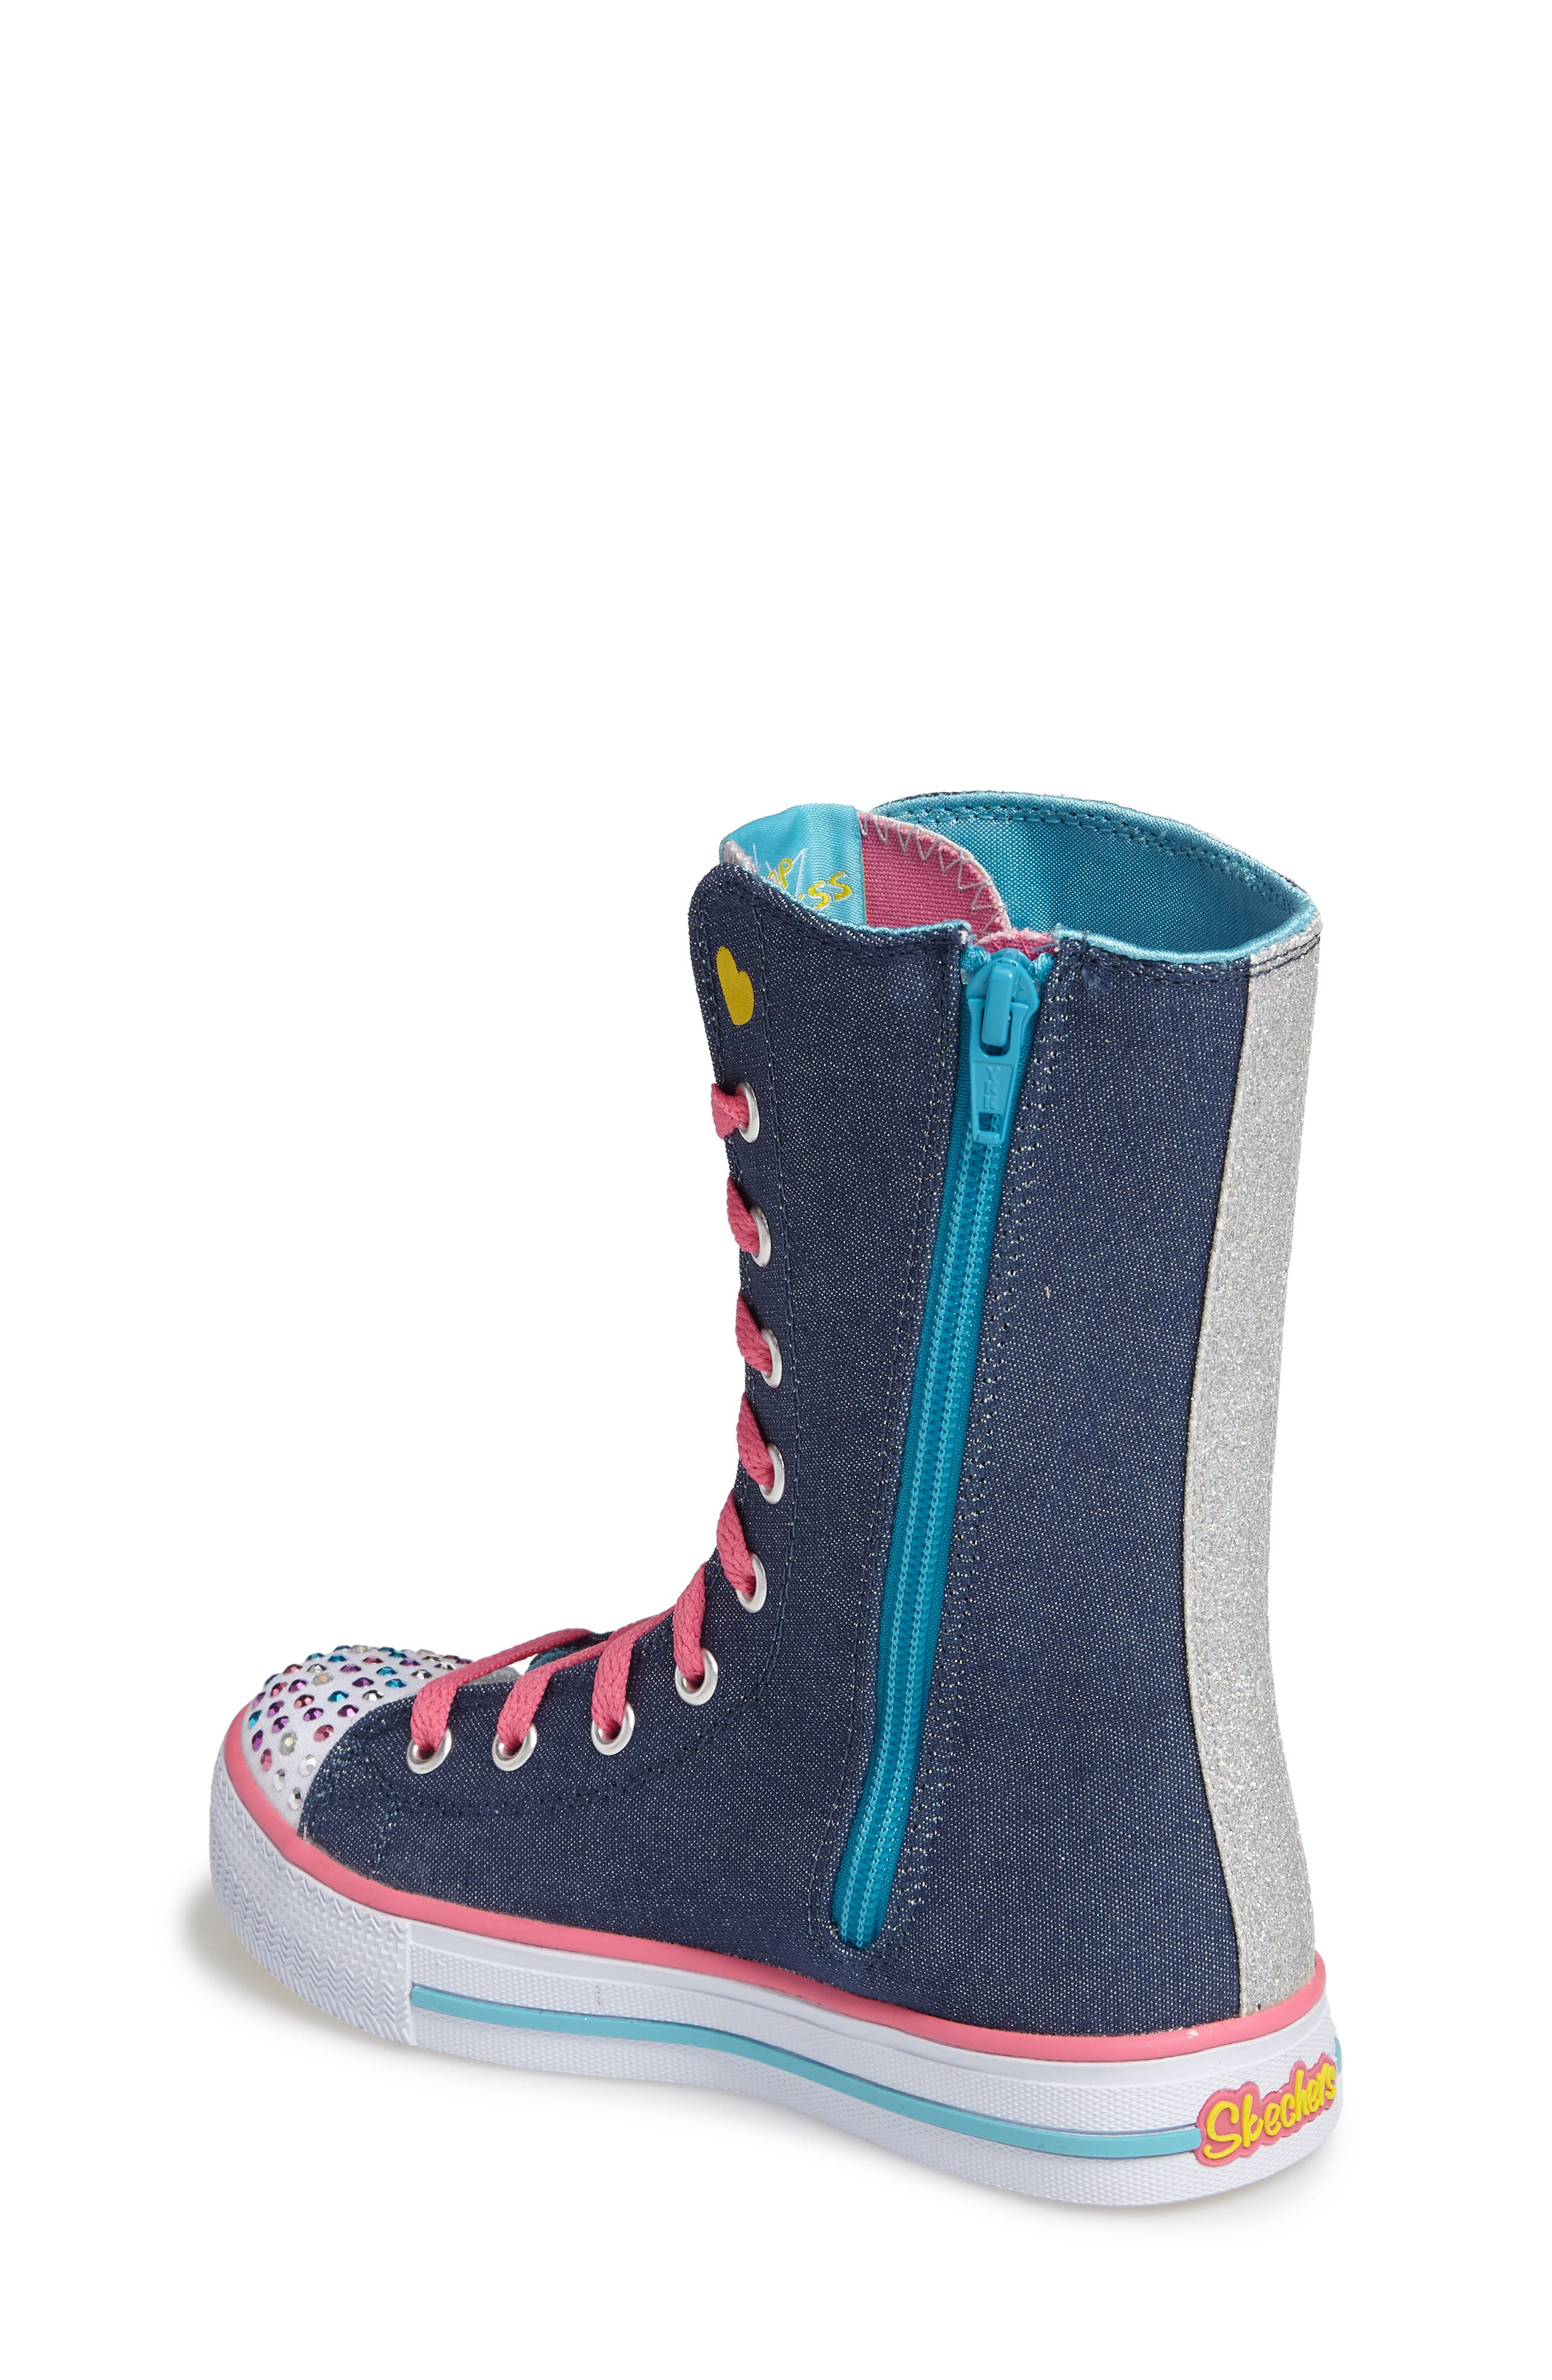 Twinkle Toes Shuffles Ultra High Top Sneaker,                             Alternate thumbnail 2, color,                             Denim/ Multi